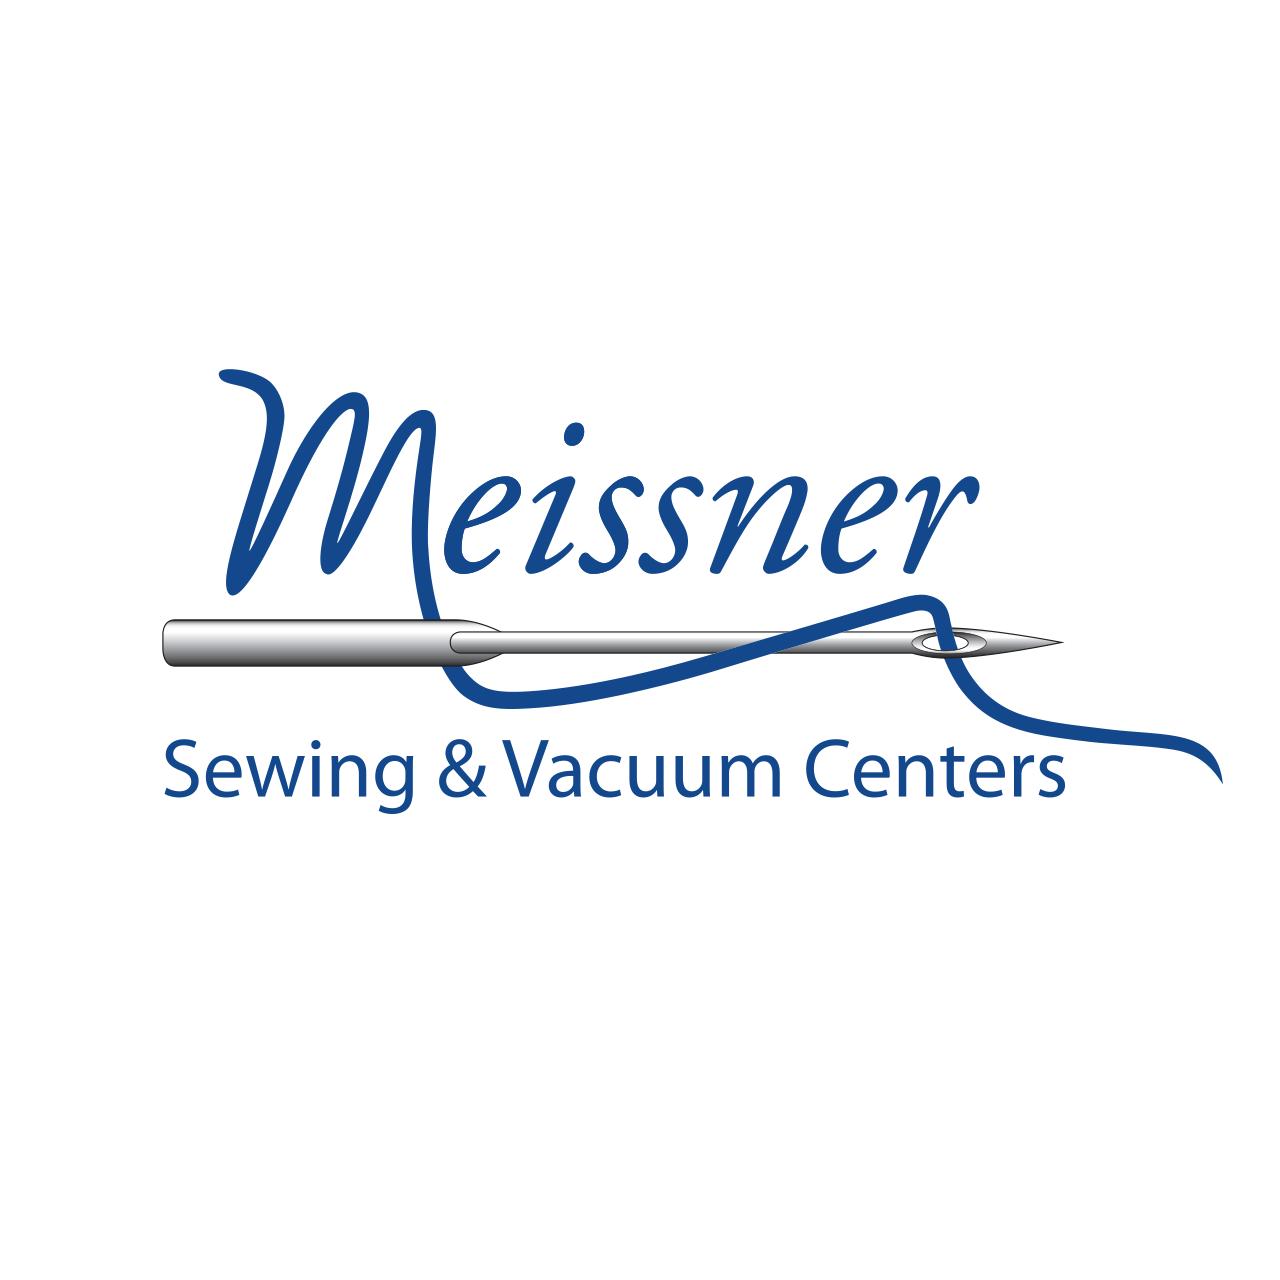 Industrial sewing machines: classes, purpose, maintenance 61